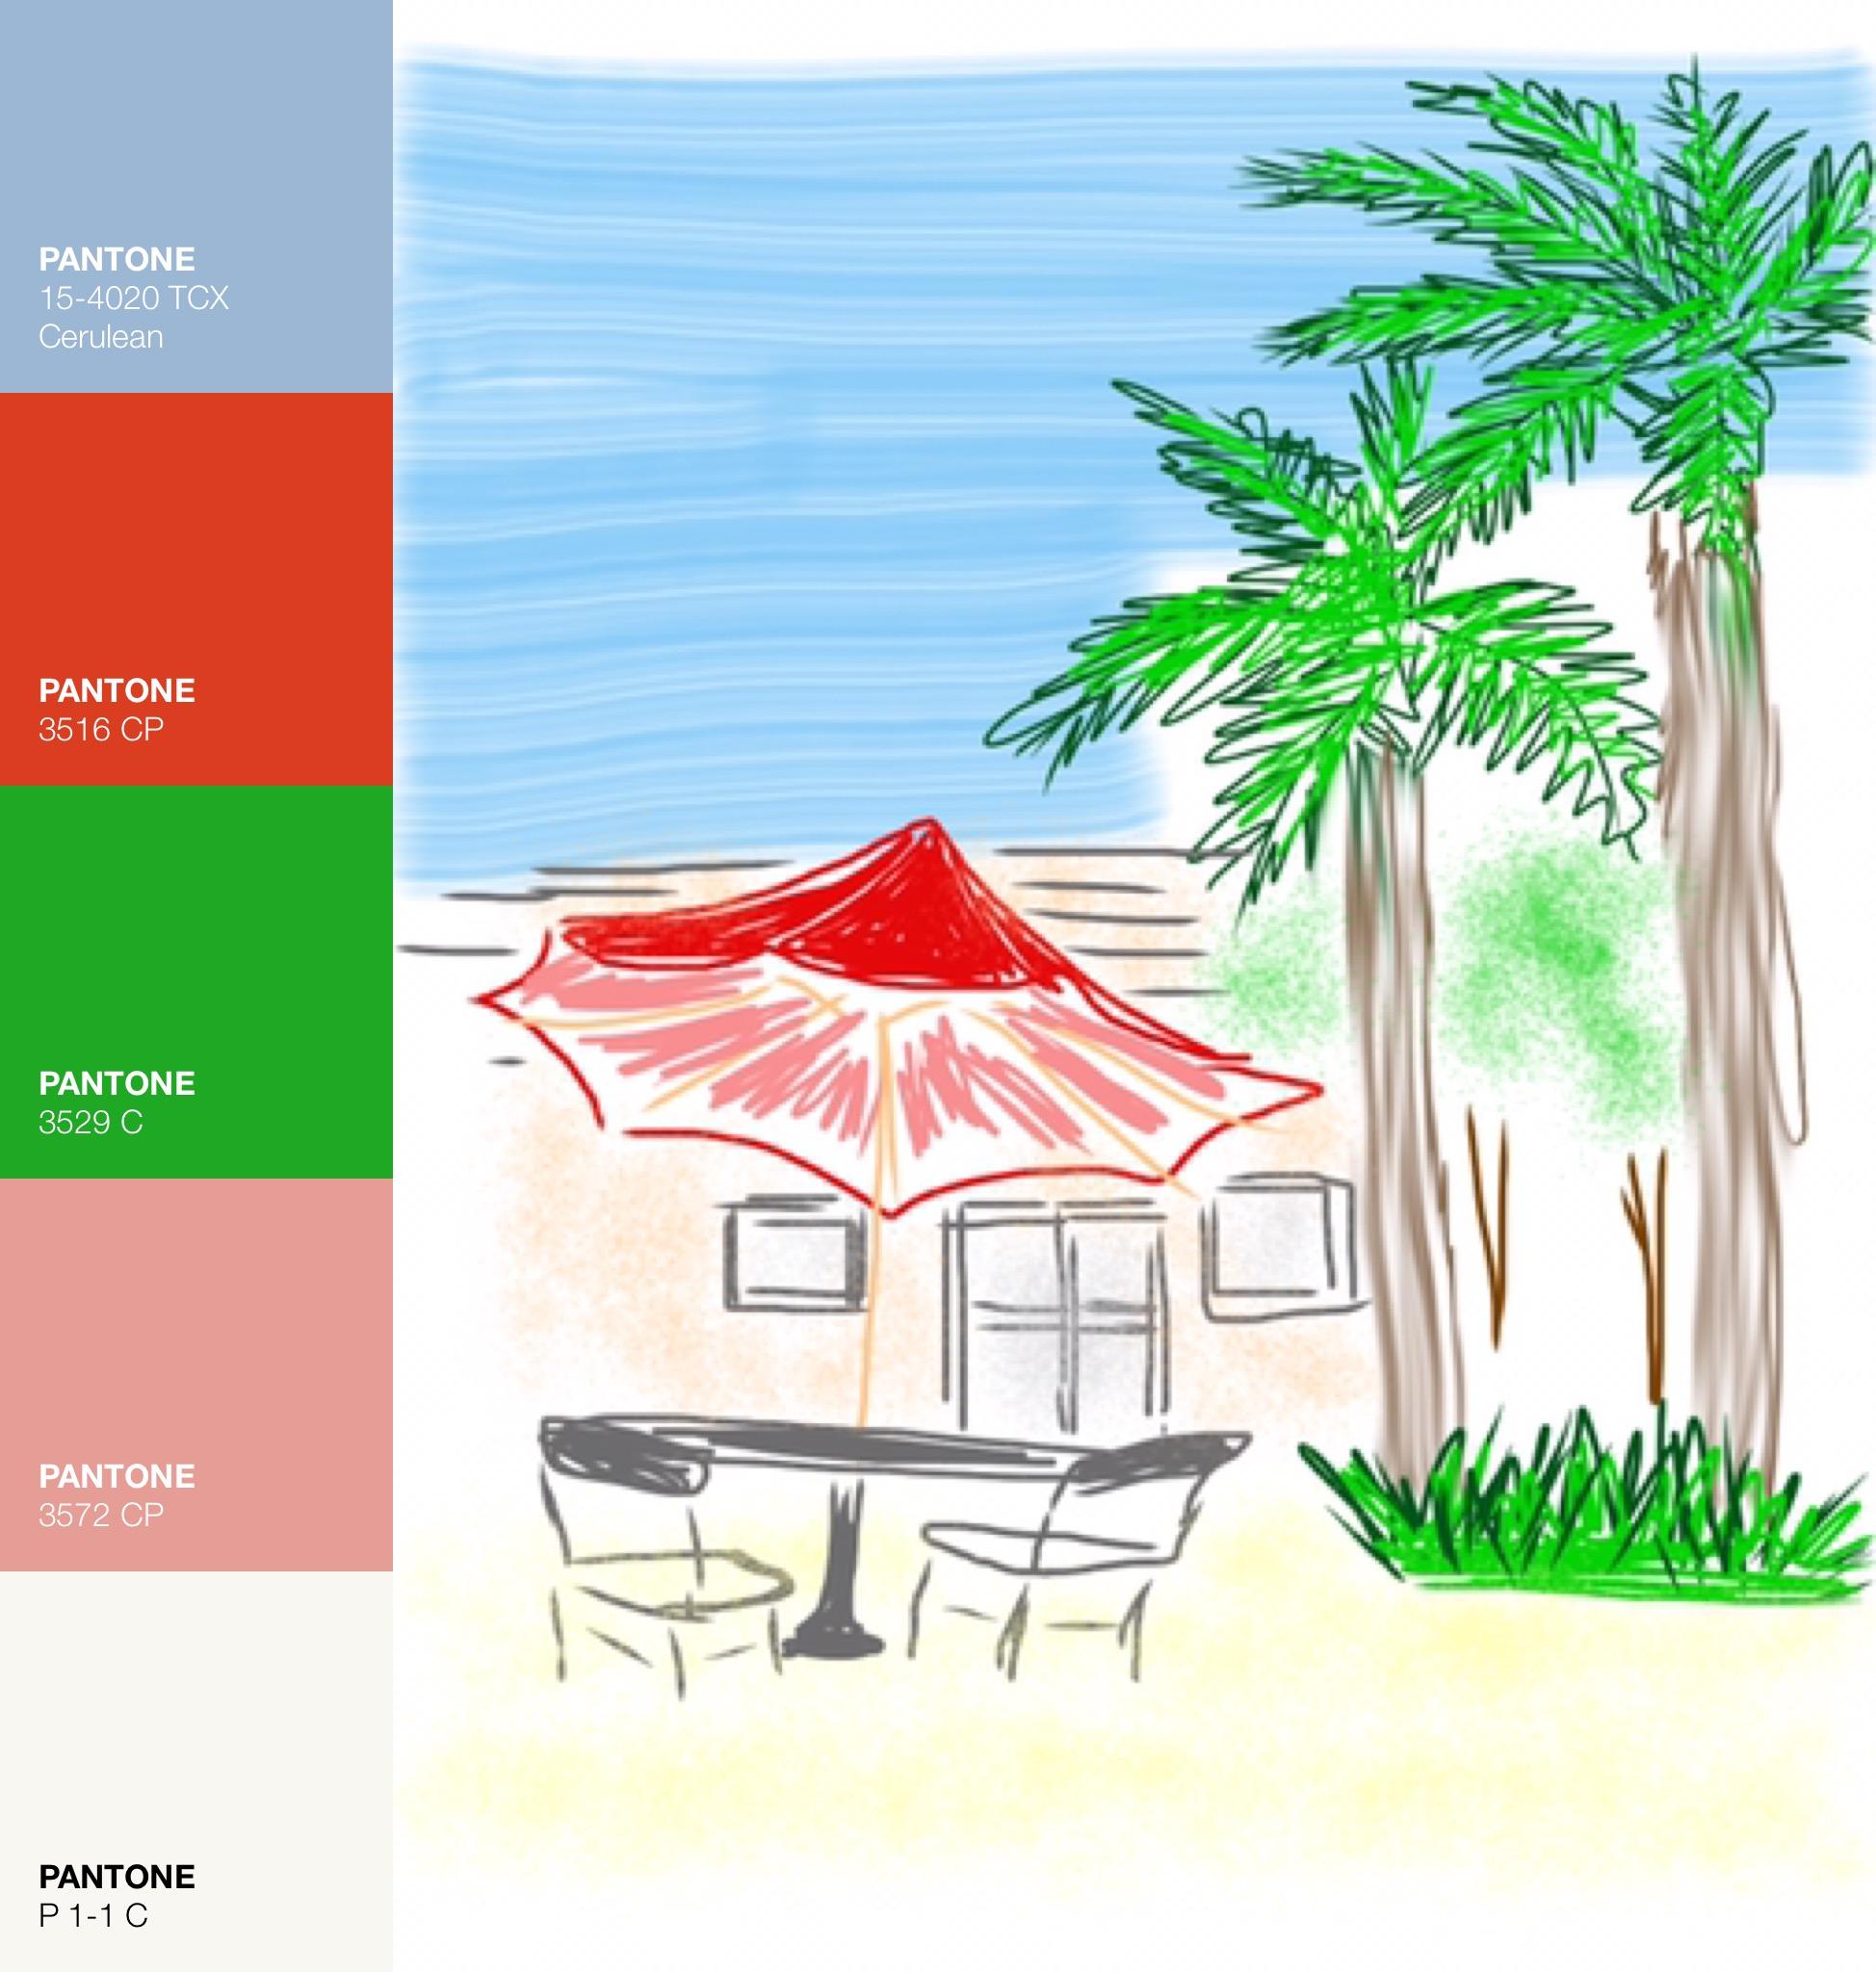 Outdoor Cafe via Art Studio App with Pantone Color Palette